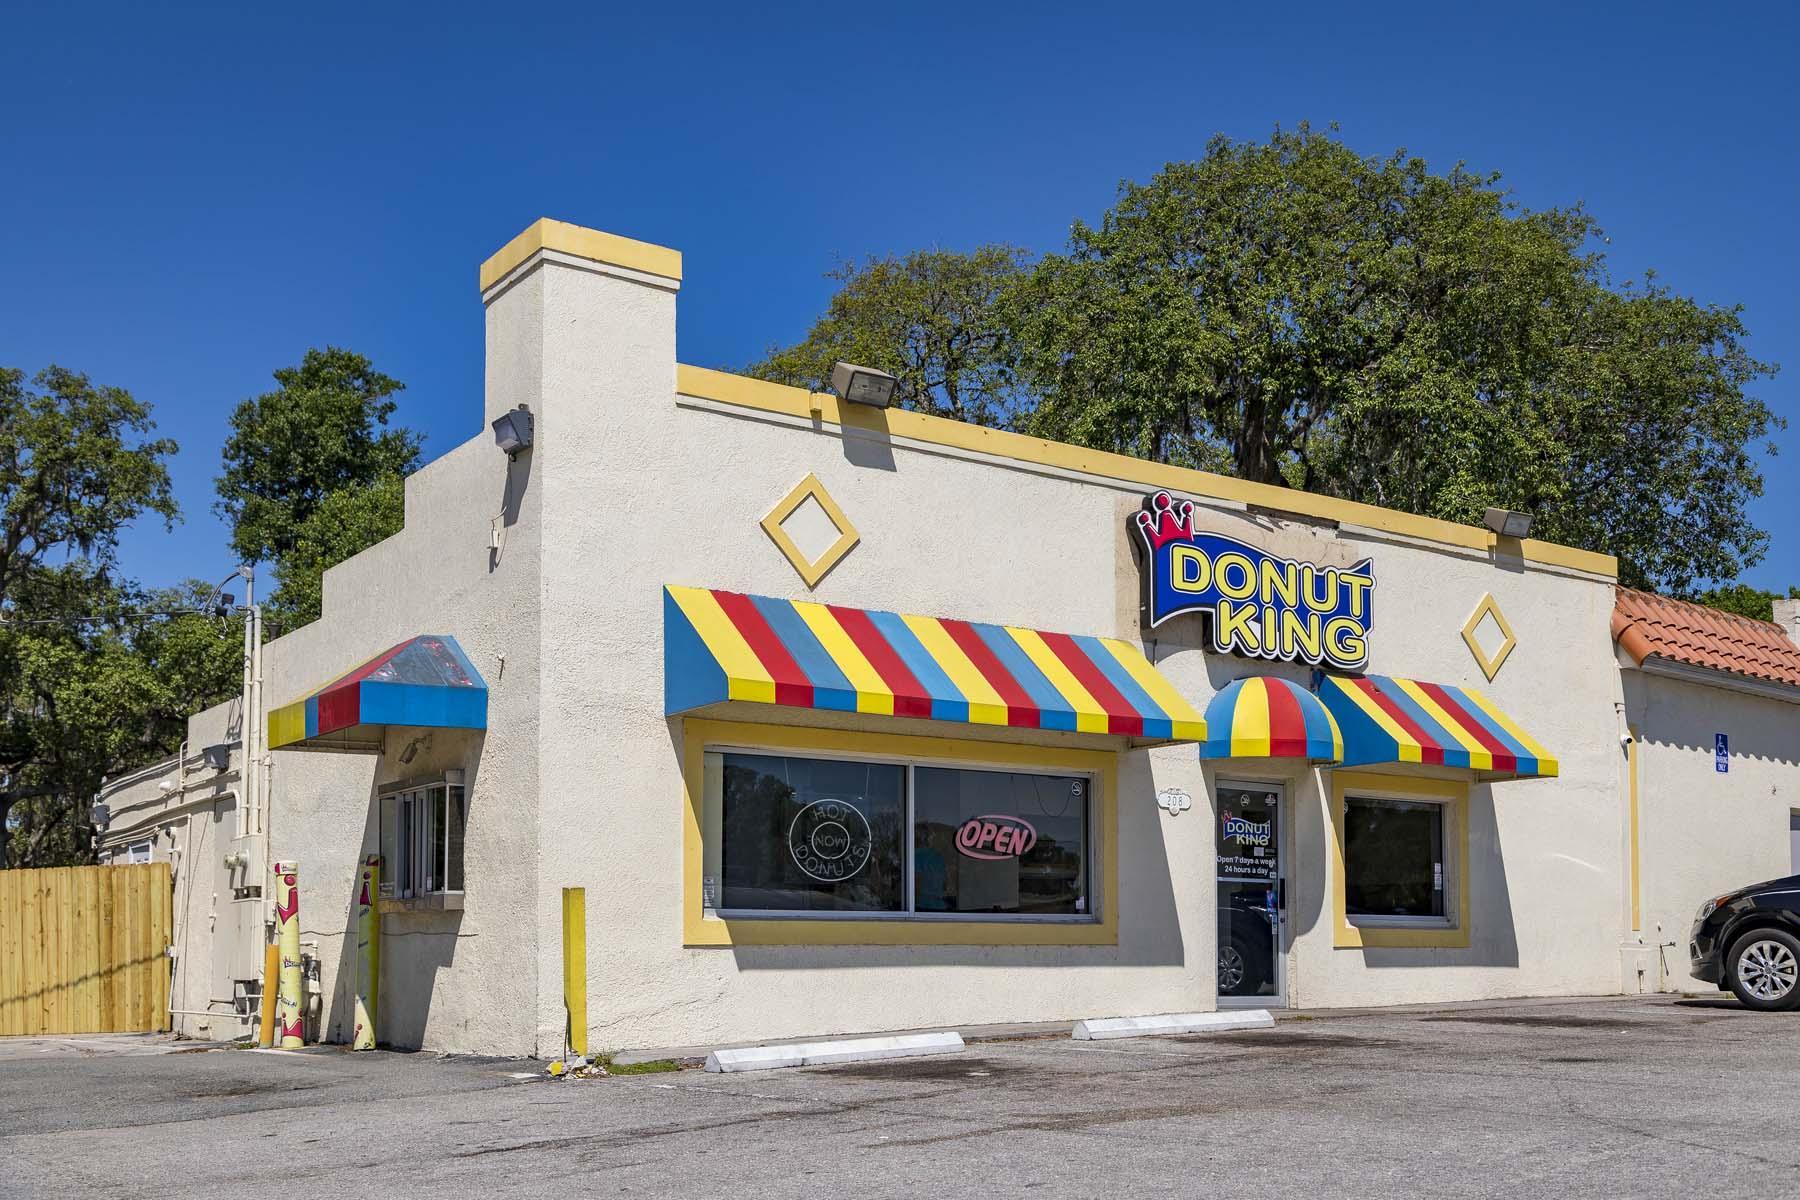 Minneola's Famous Donut King